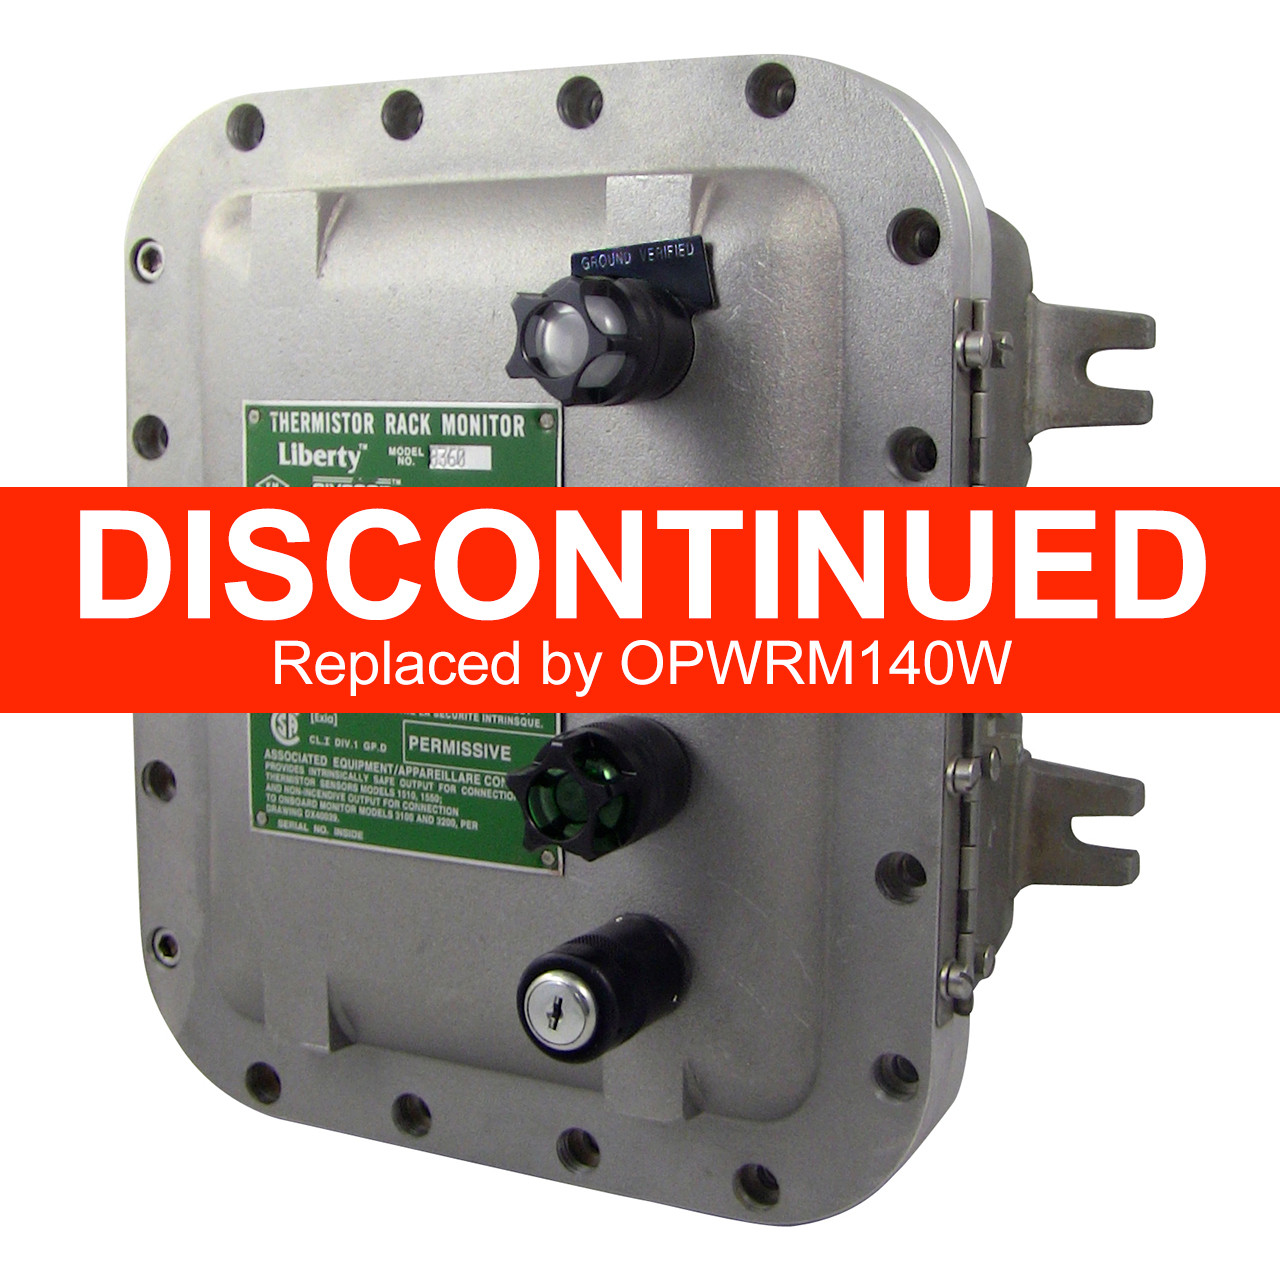 medium resolution of civacon 8360 thermistor monitor john m ellsworth co inc civacon thermistor wiring diagram